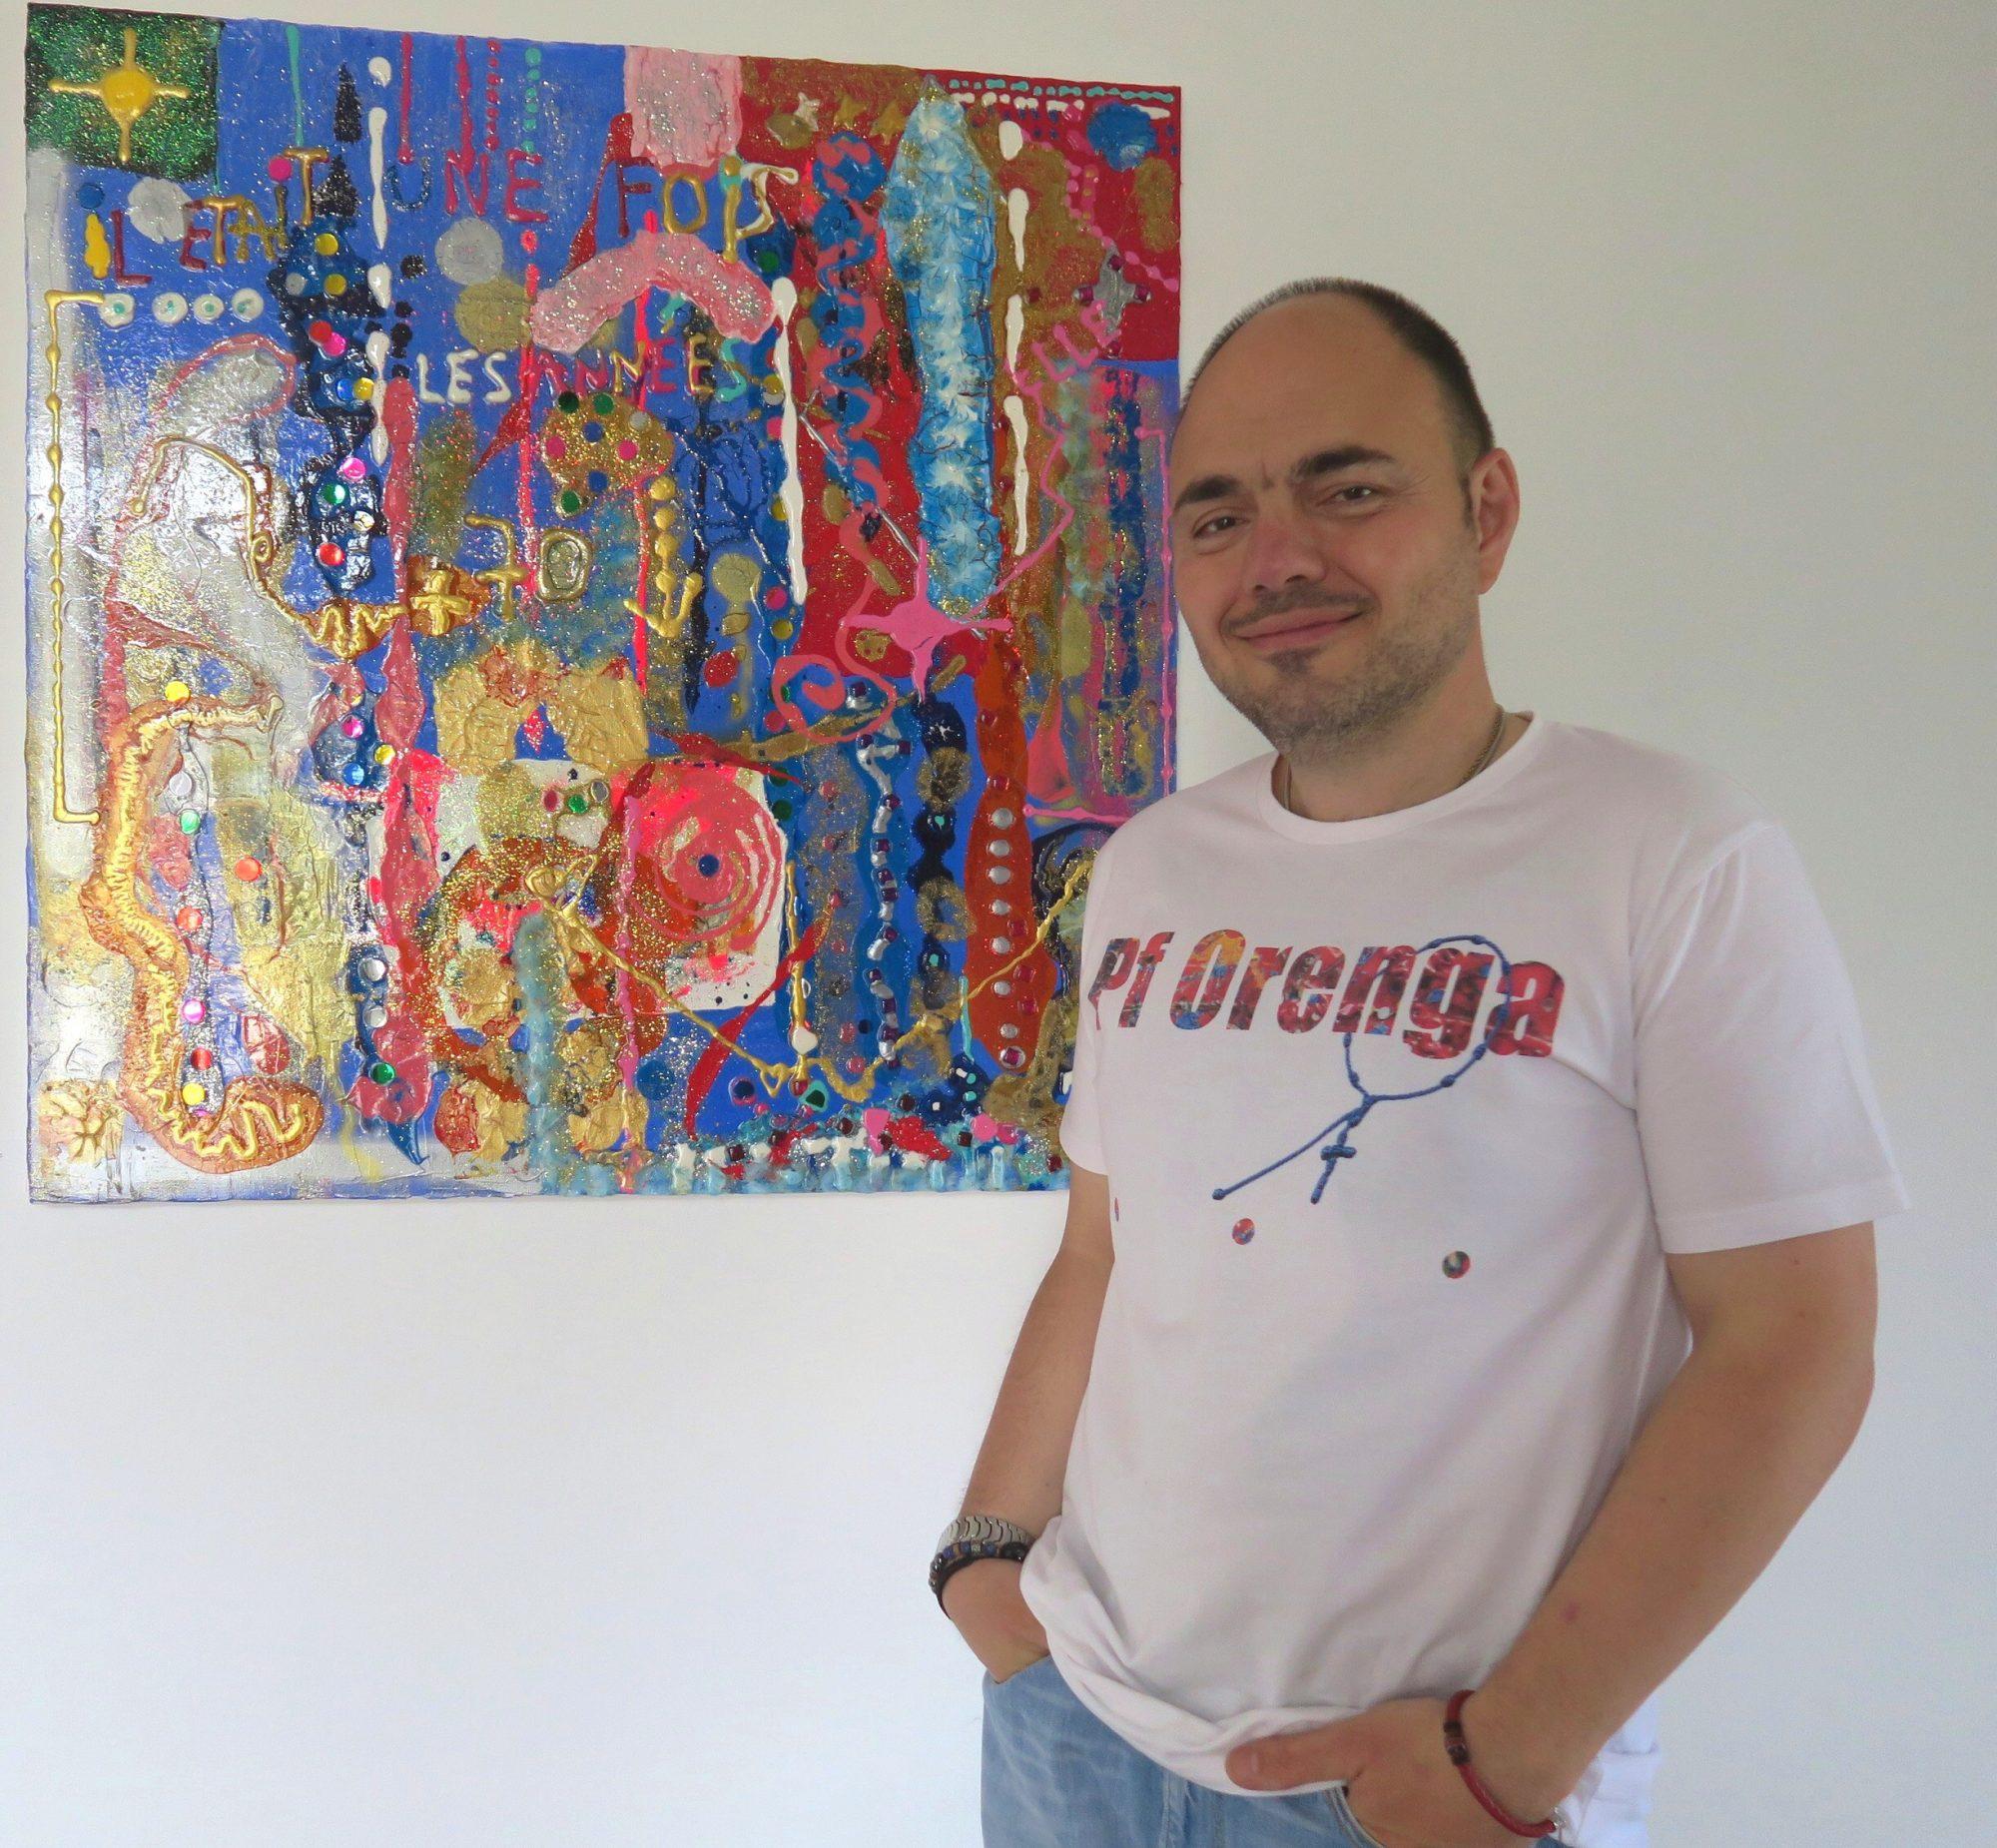 Pierre-François Orenga